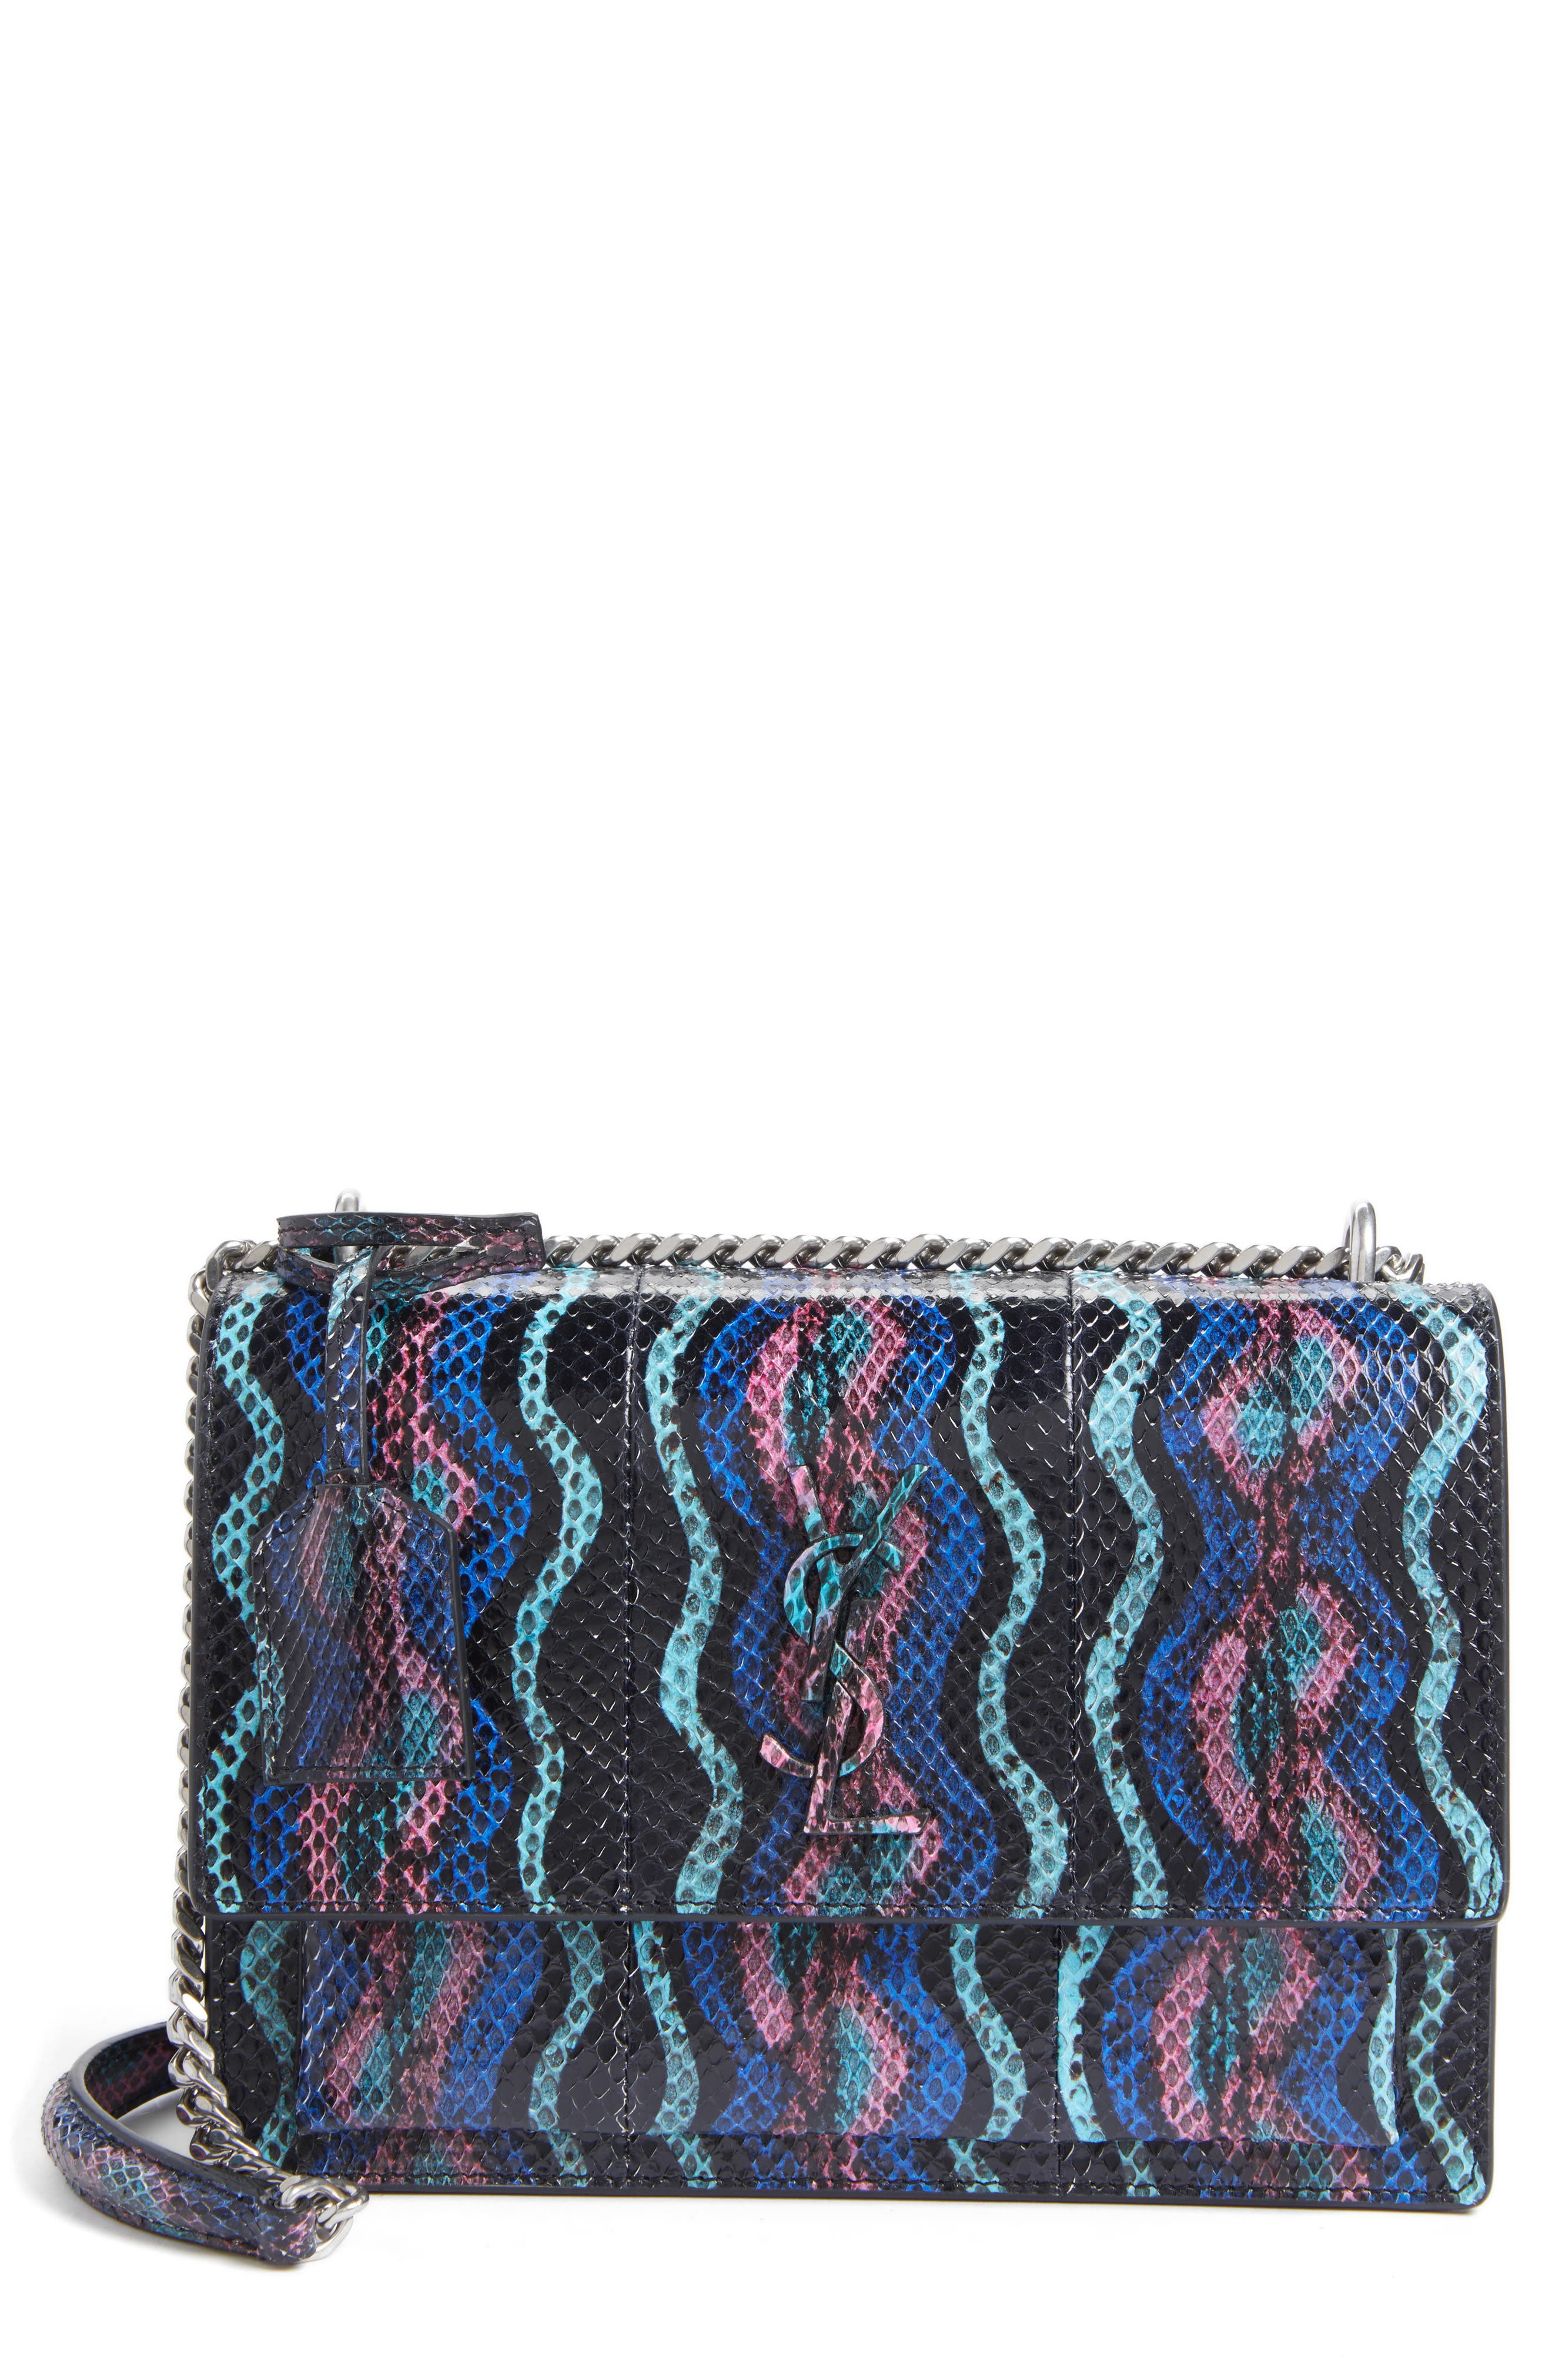 Medium Monogram Sunset Genuine Snakeskin Crossbody Bag,                             Main thumbnail 1, color,                             124